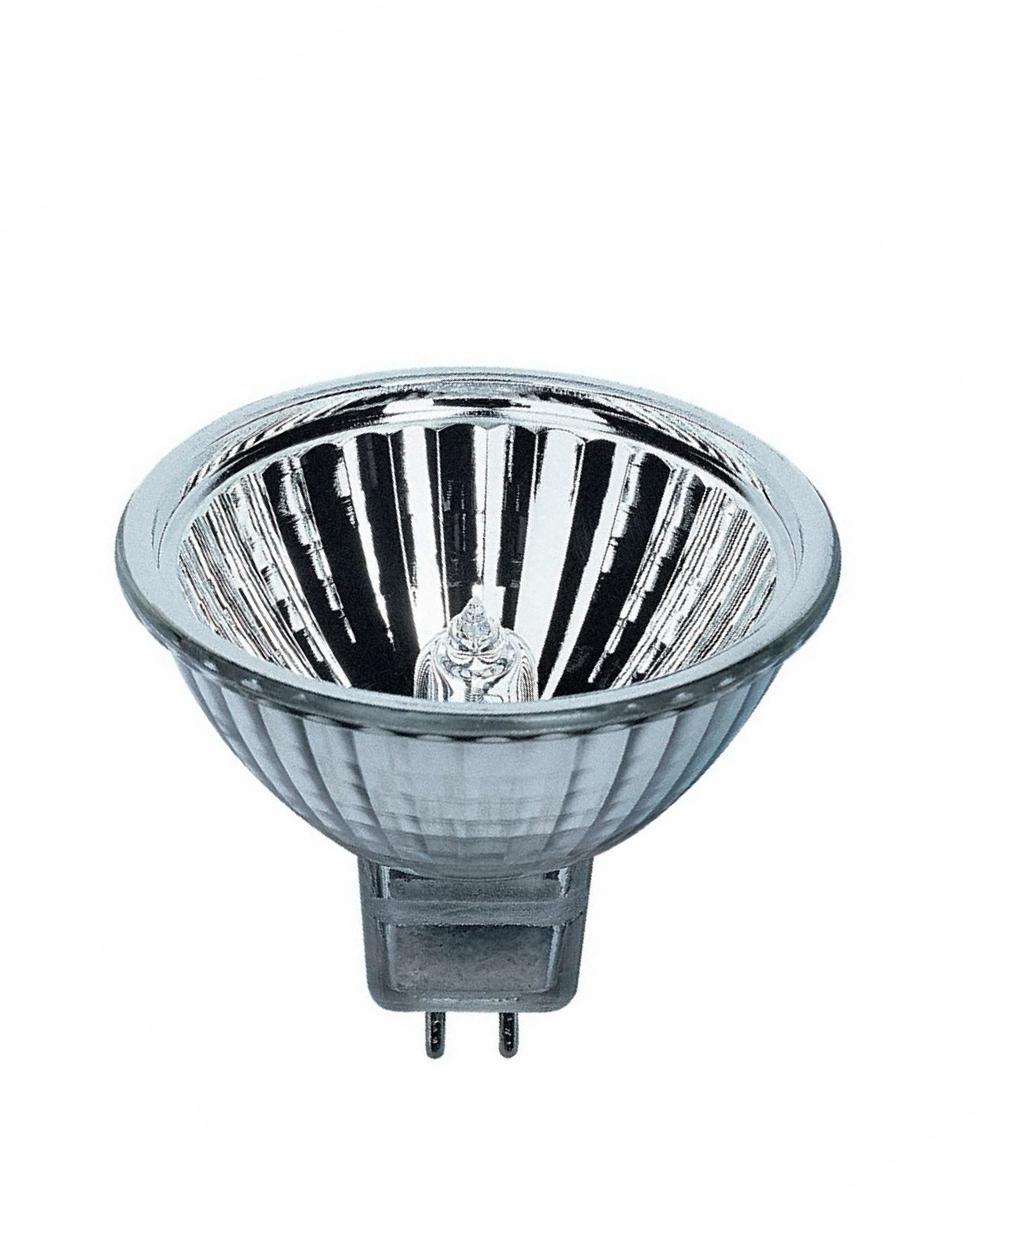 1 Stk QR-C 51 ALU 50W WFL 36° GU 5,3, NV-Reflektorl.Alubeschichtet LI5U41871W